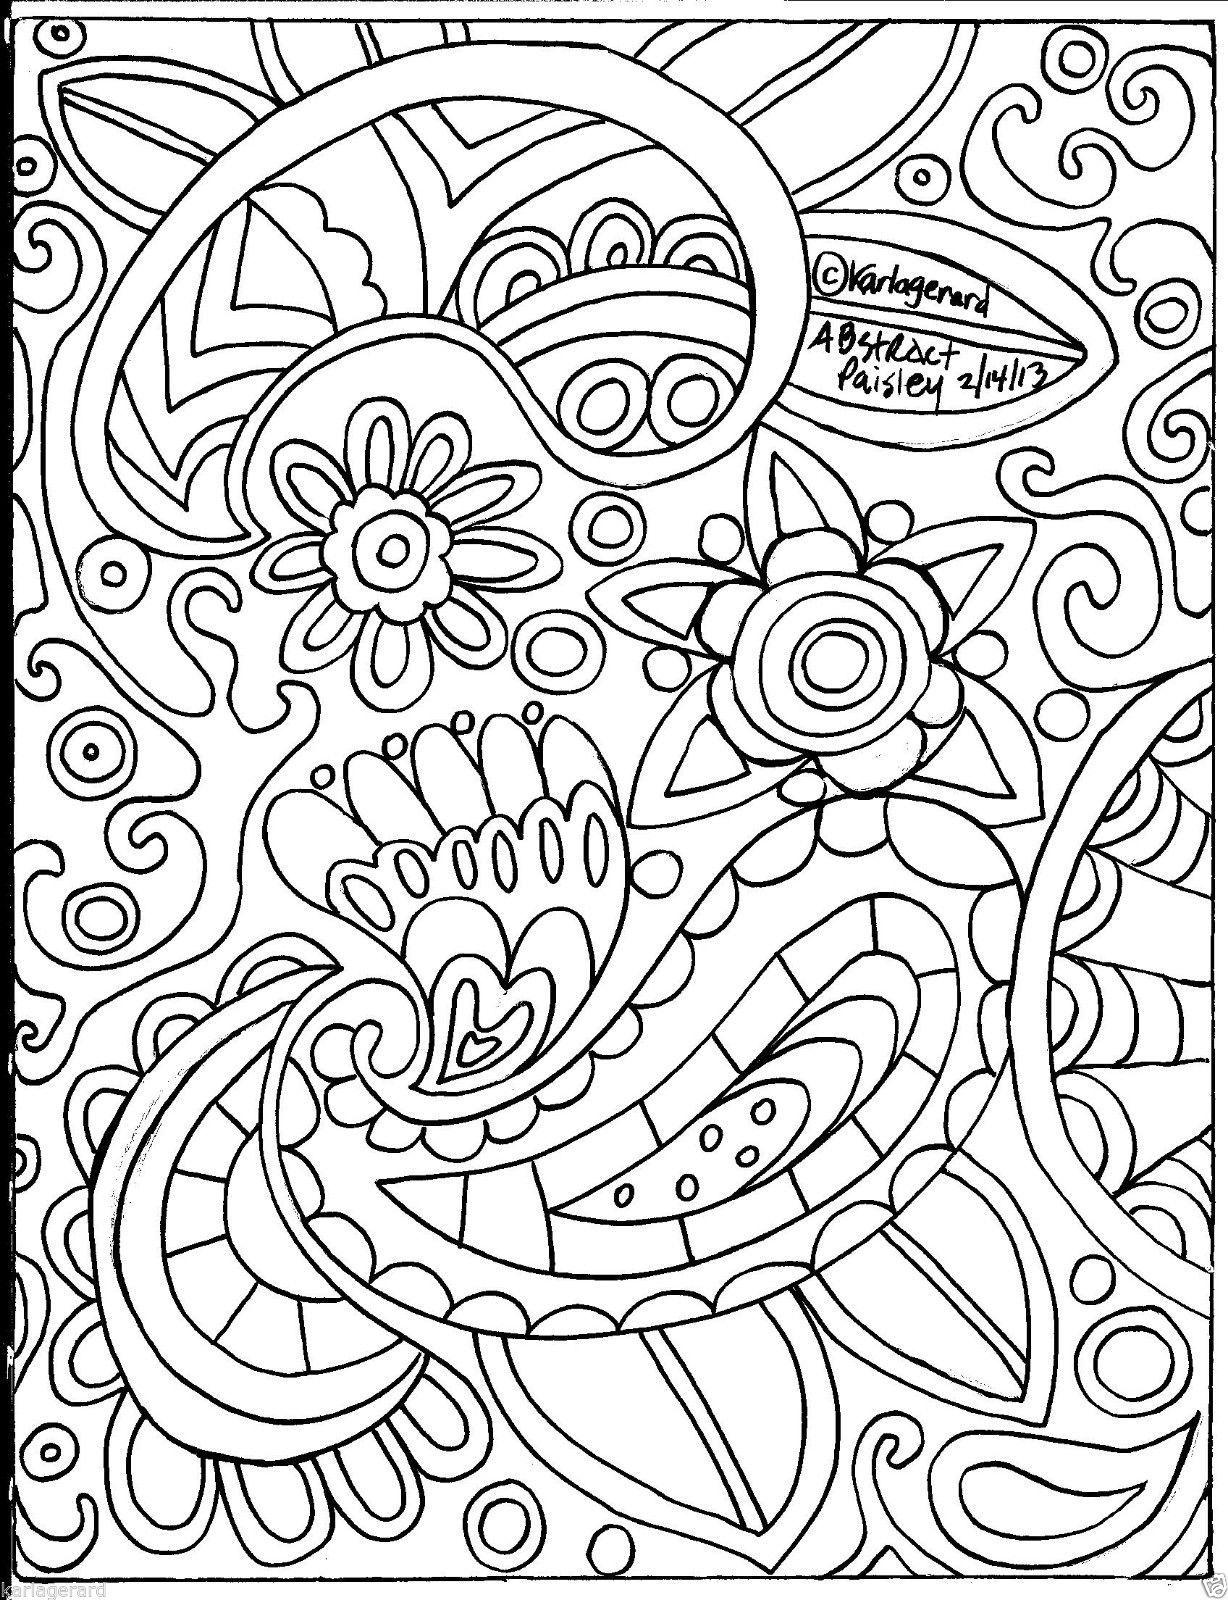 Rug Hooking Paper Pattern Abstract Paisley Folk Art Unique Karla G Bordado Popular Patrones De Alfombra De Enganche Alfombra De Enganche